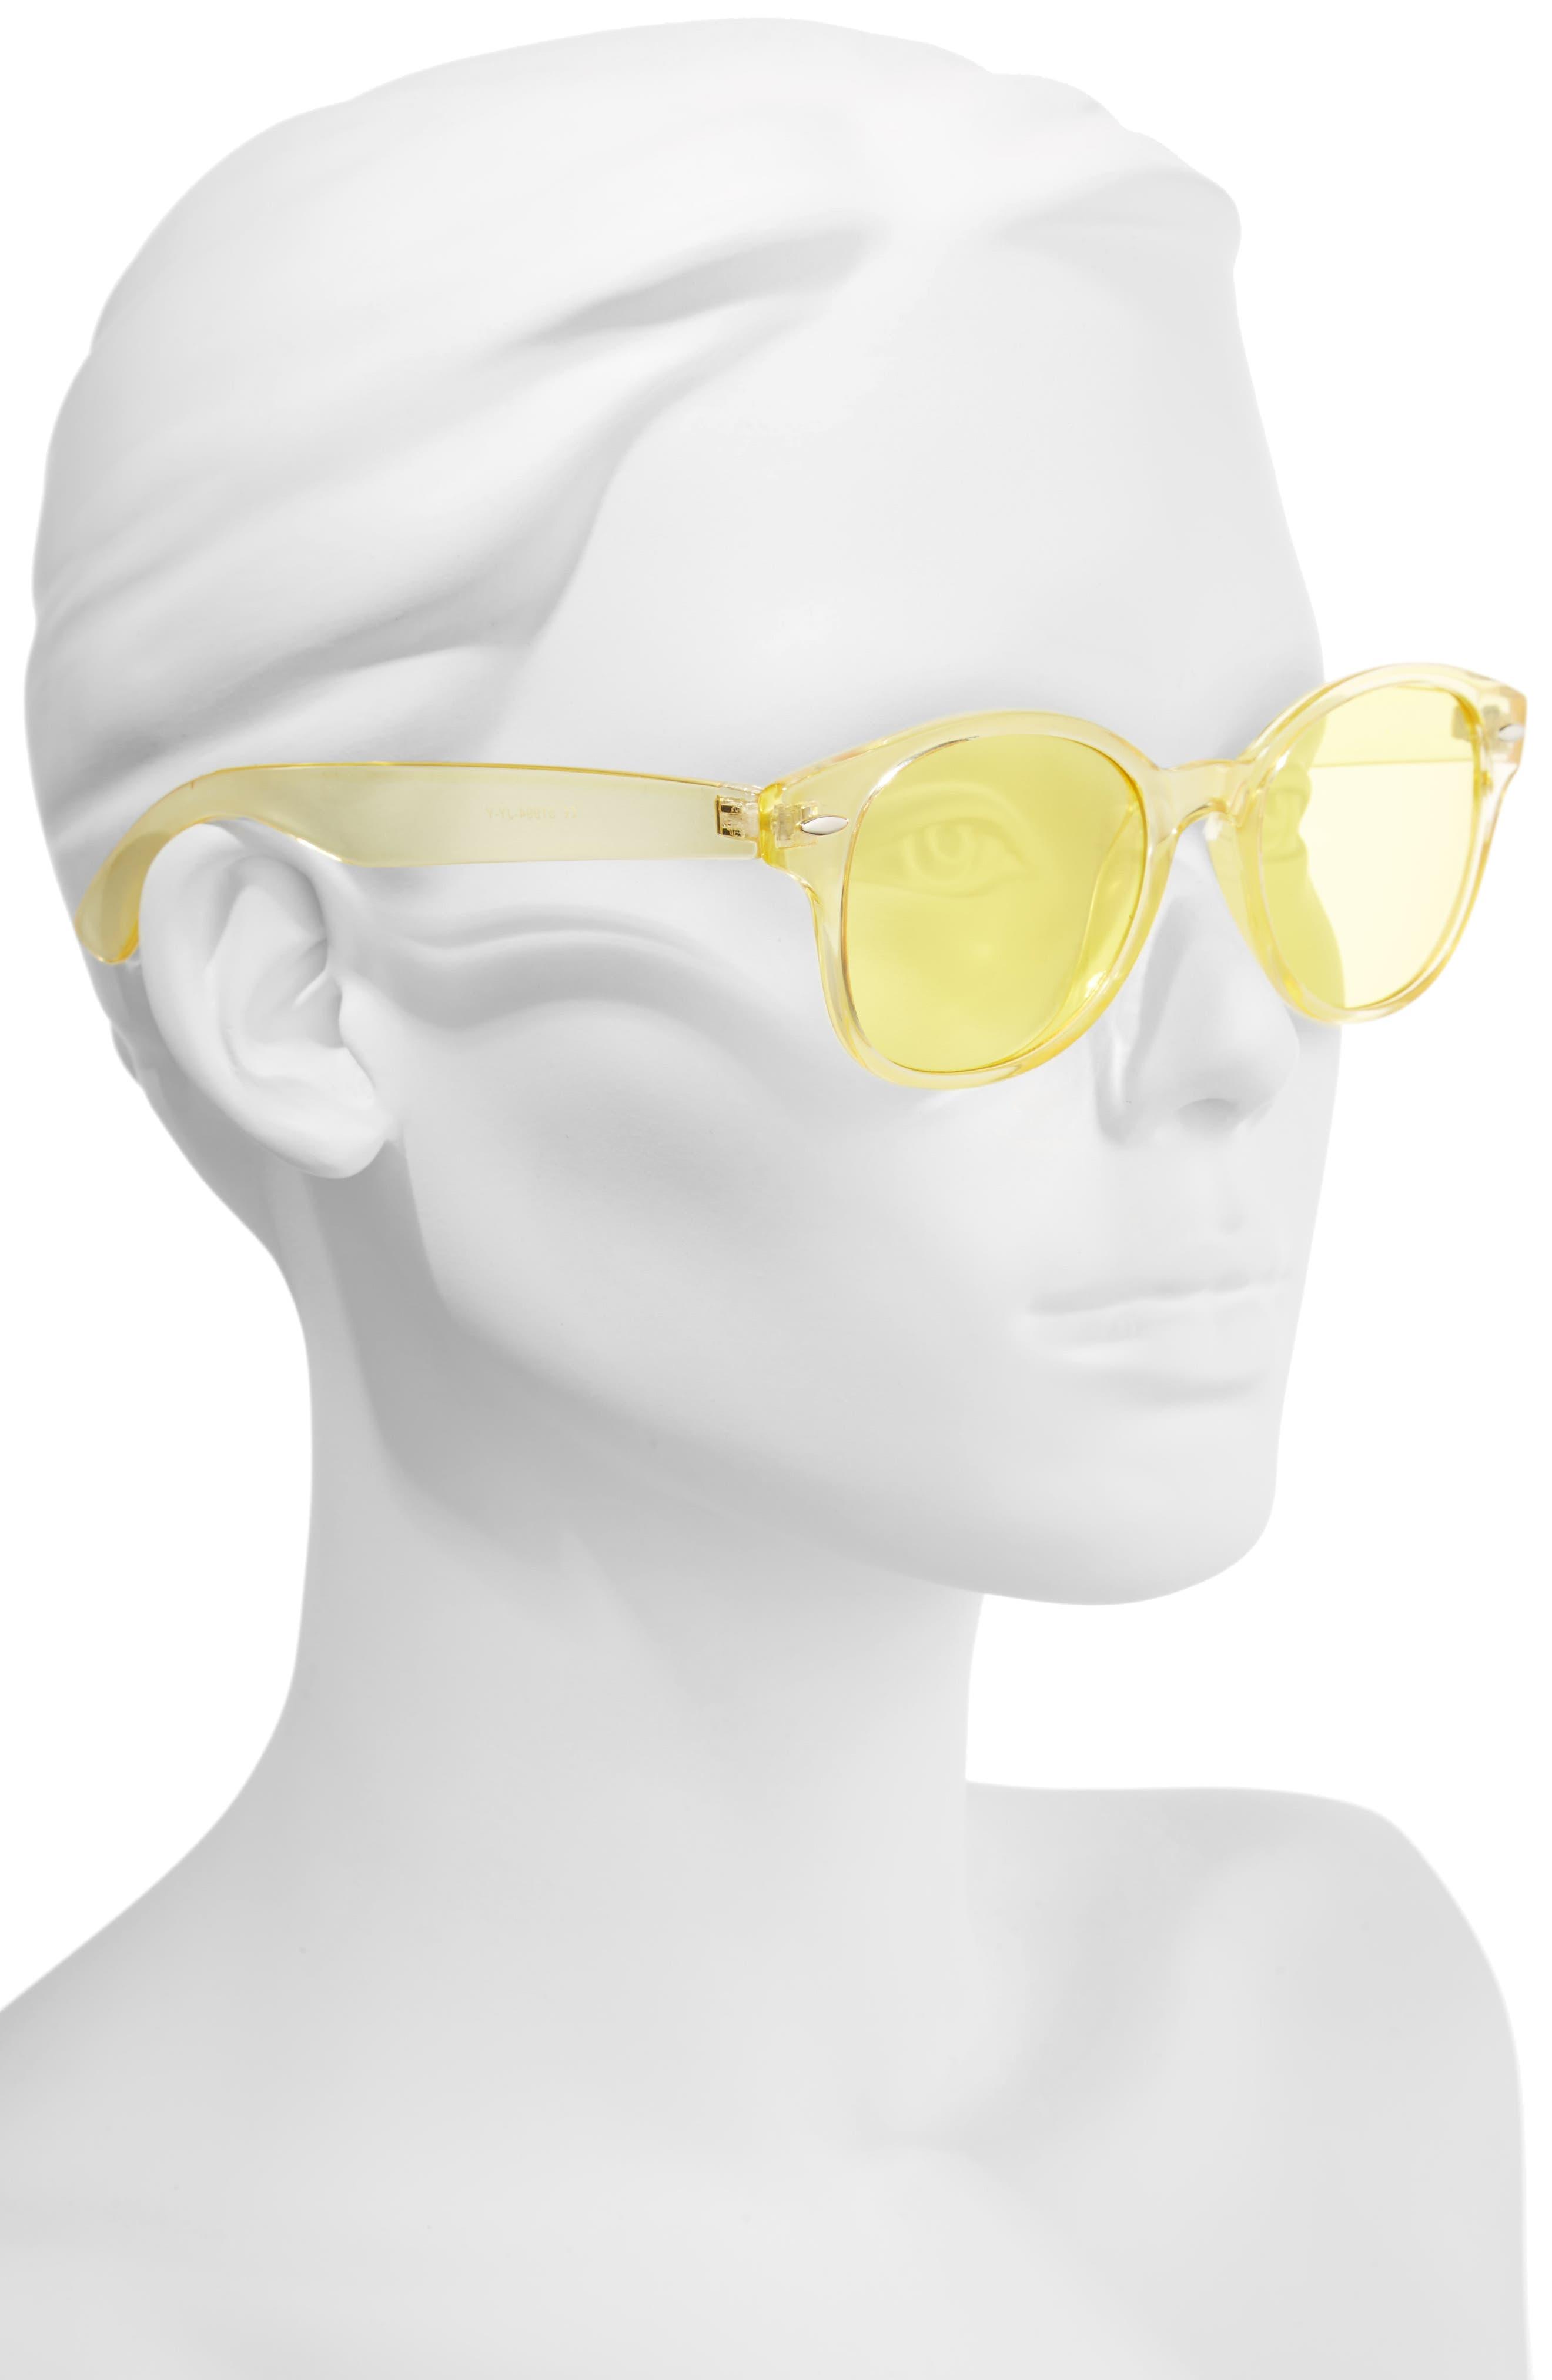 50mm Transparent Round Sunglasses,                             Alternate thumbnail 2, color,